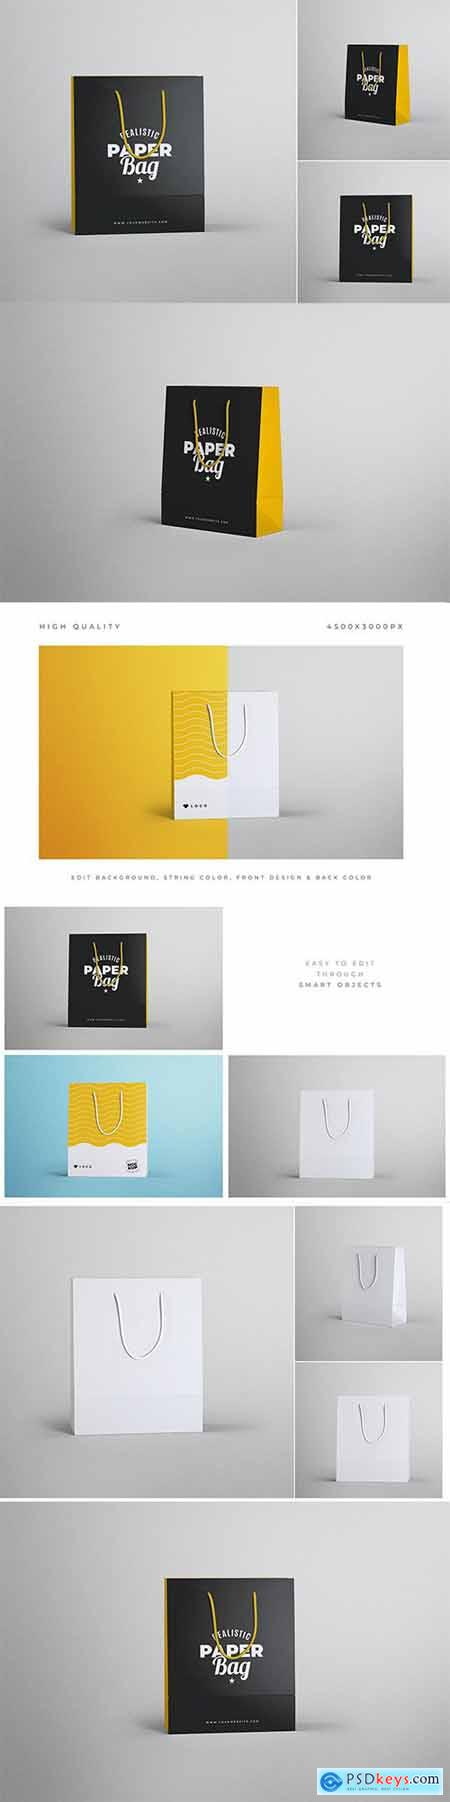 Paper Bag Branding Mockups